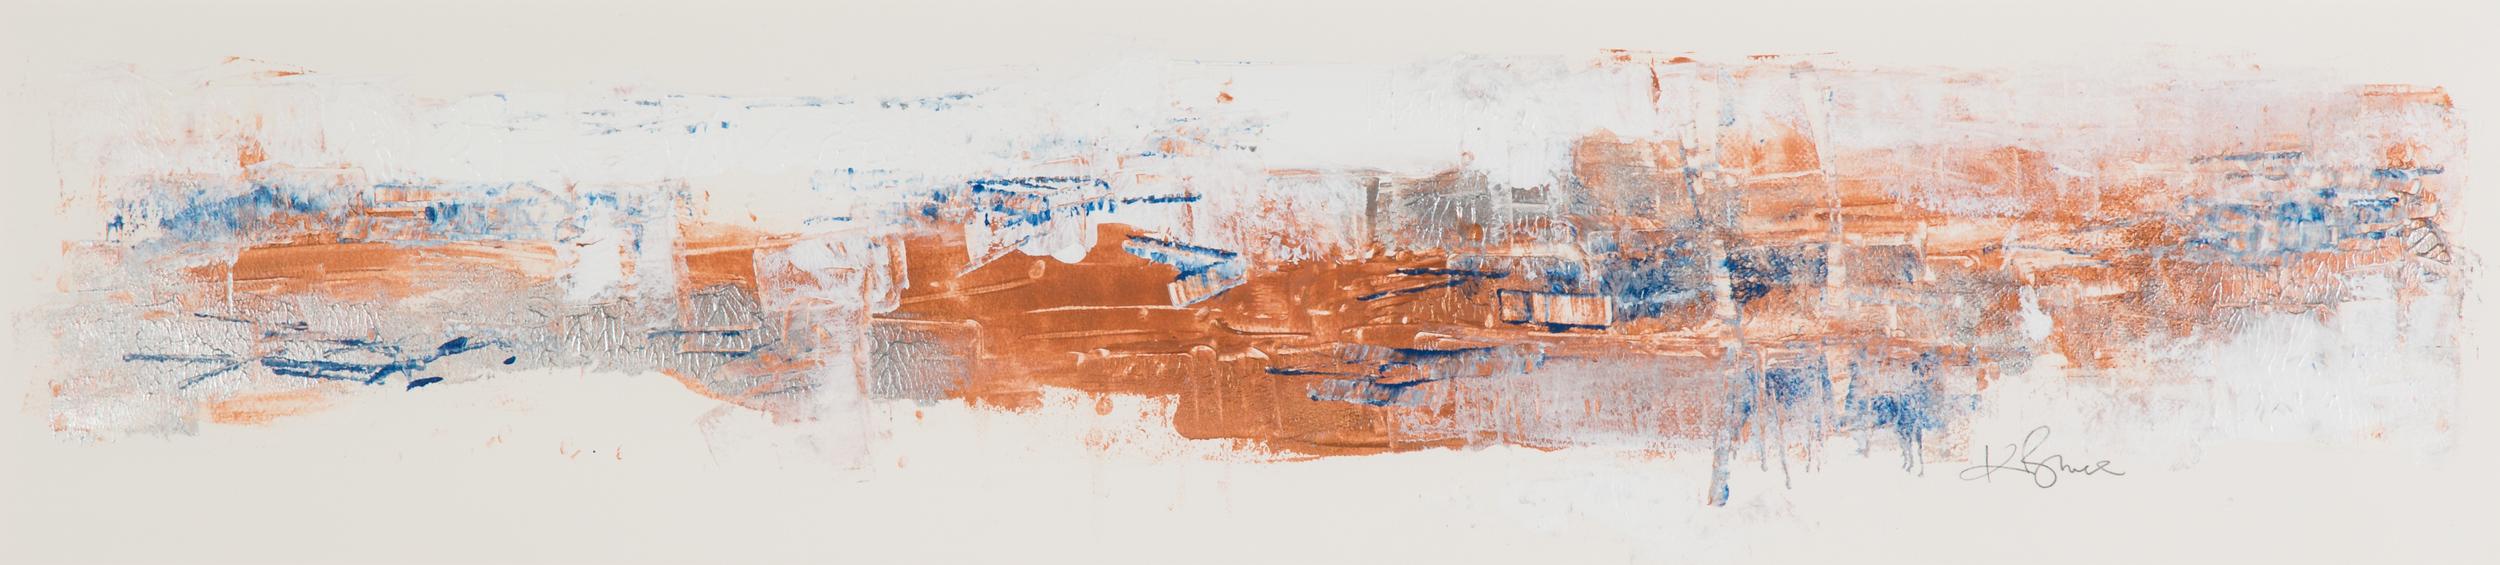 KB-062, Katharine Bruce, Sand Strolling, Acrylic on Paper, 2015, 44 x 9, $2,250